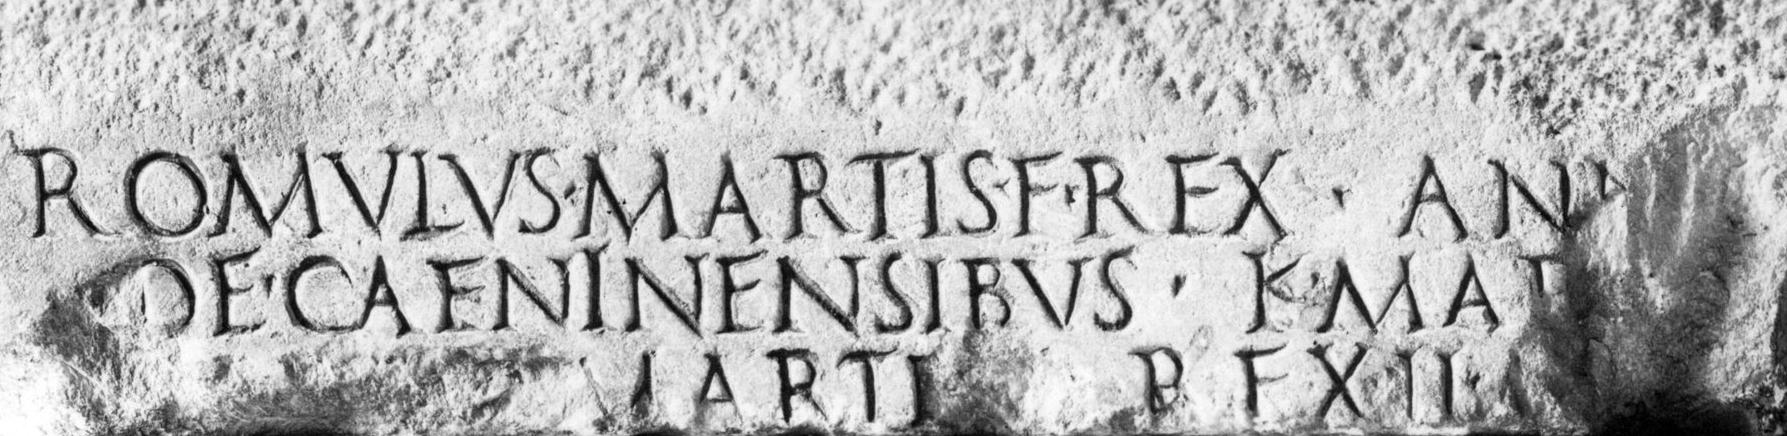 Fasti Triumphales Romulus F martis CIL 1(2) 1, p. 43 (I).jpg